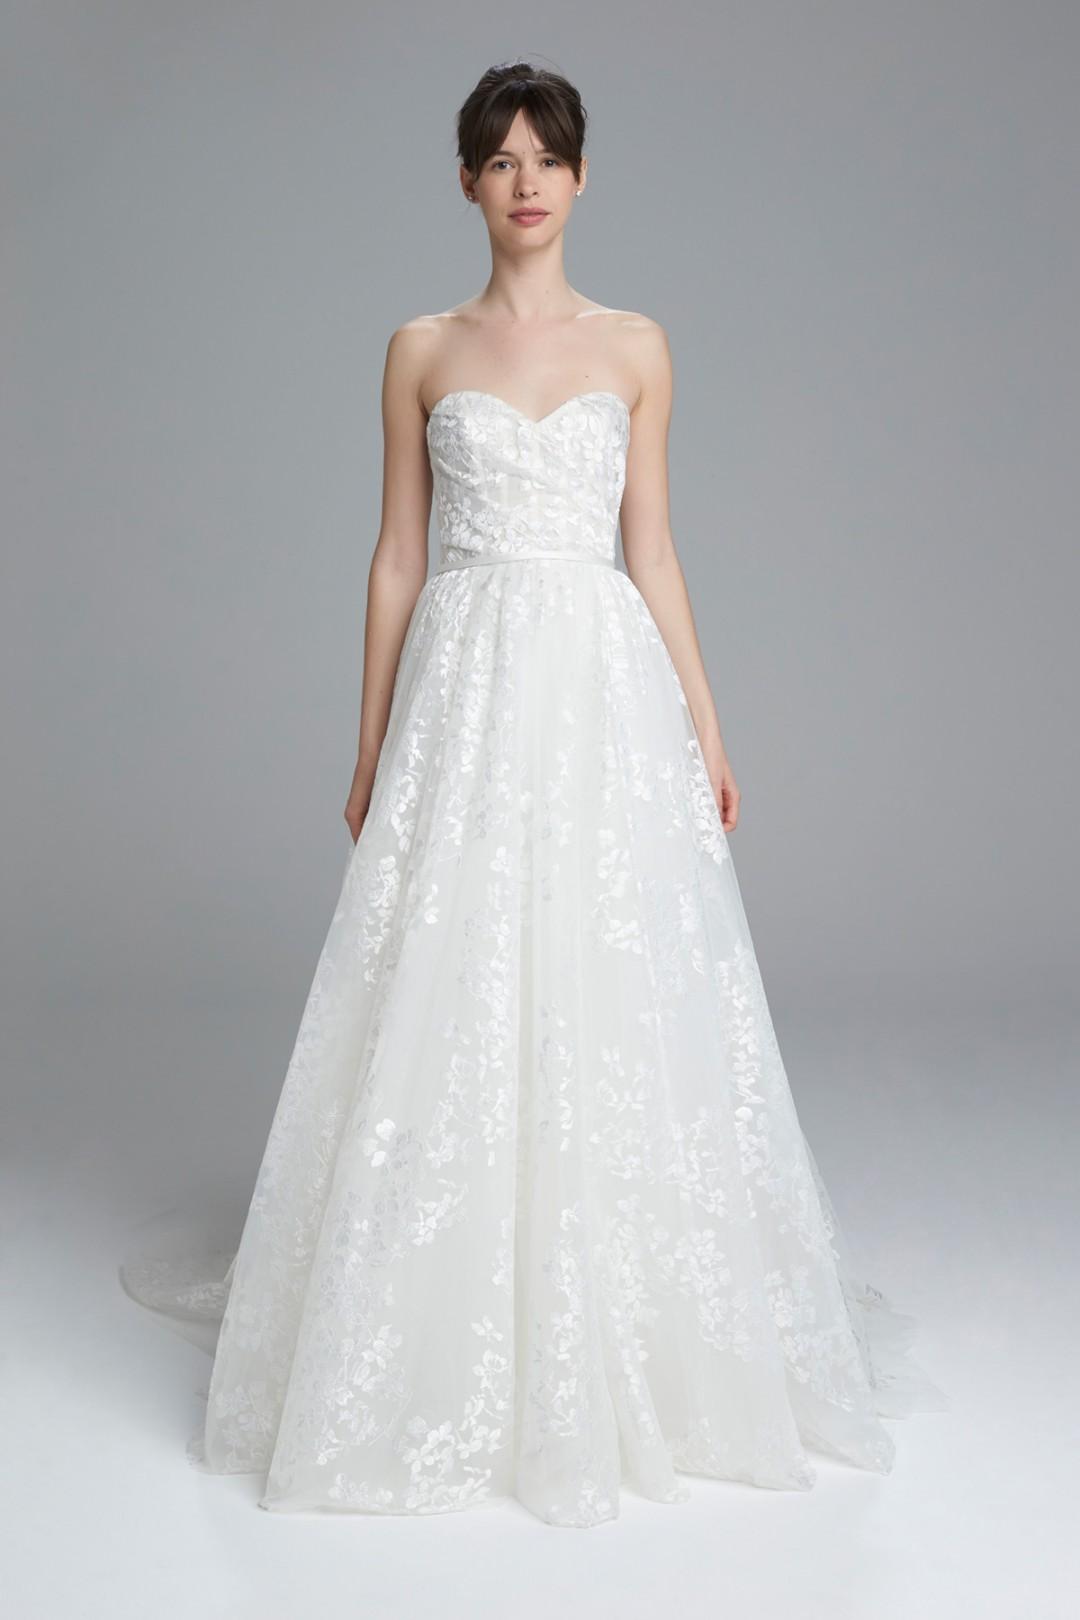 Floral-tulle-strapless-bridal-ballgown_Christie-by-Amsale-1080x1620.jpg